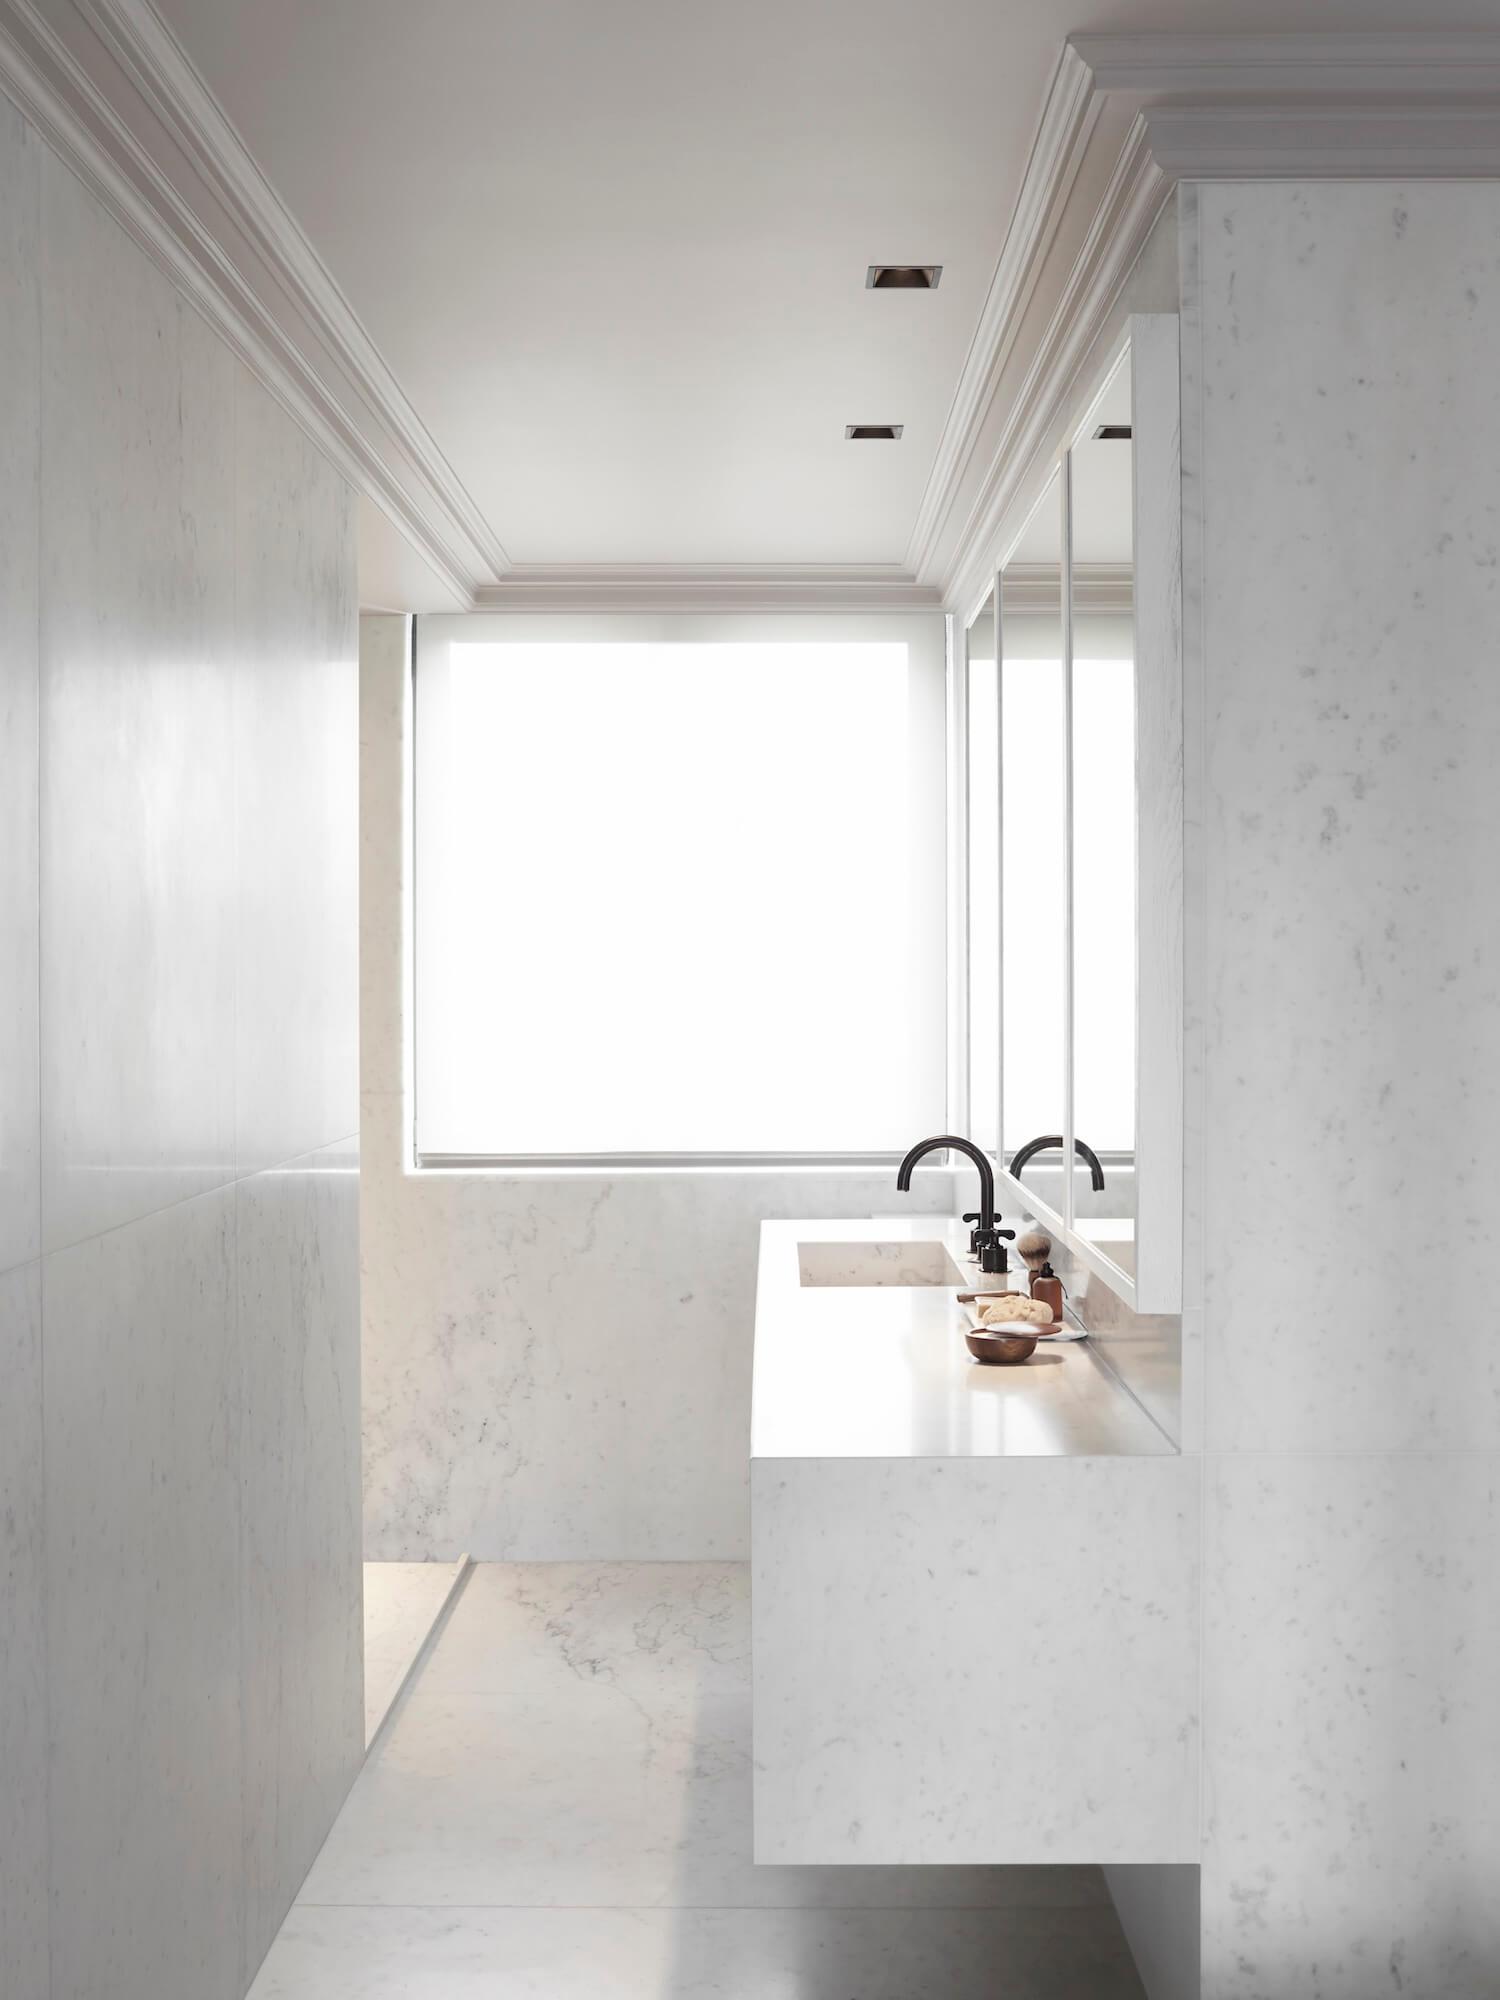 phong cách tối giản elledecoration vietnam-paris-apartment-guillaume-alan11